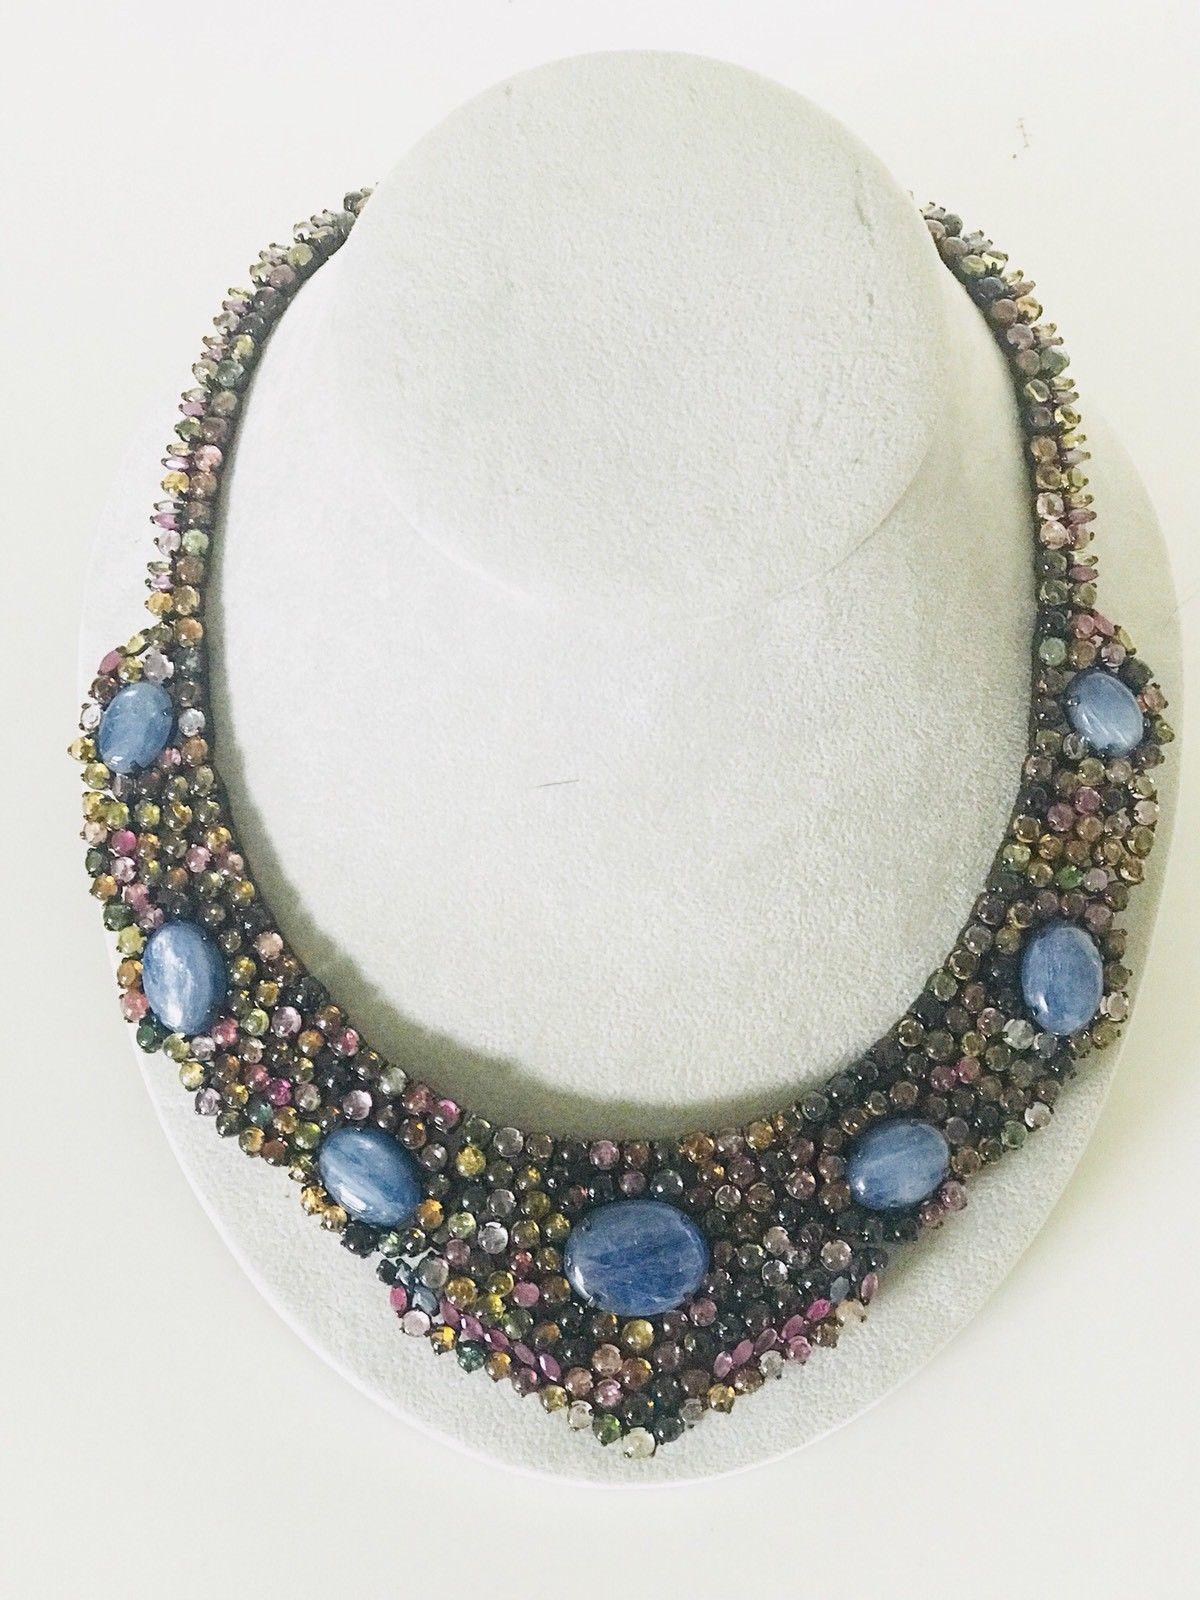 Huge Custom 569 ct Natural Blue Kyanite Tourmaline 925 Sterling Silver Necklace